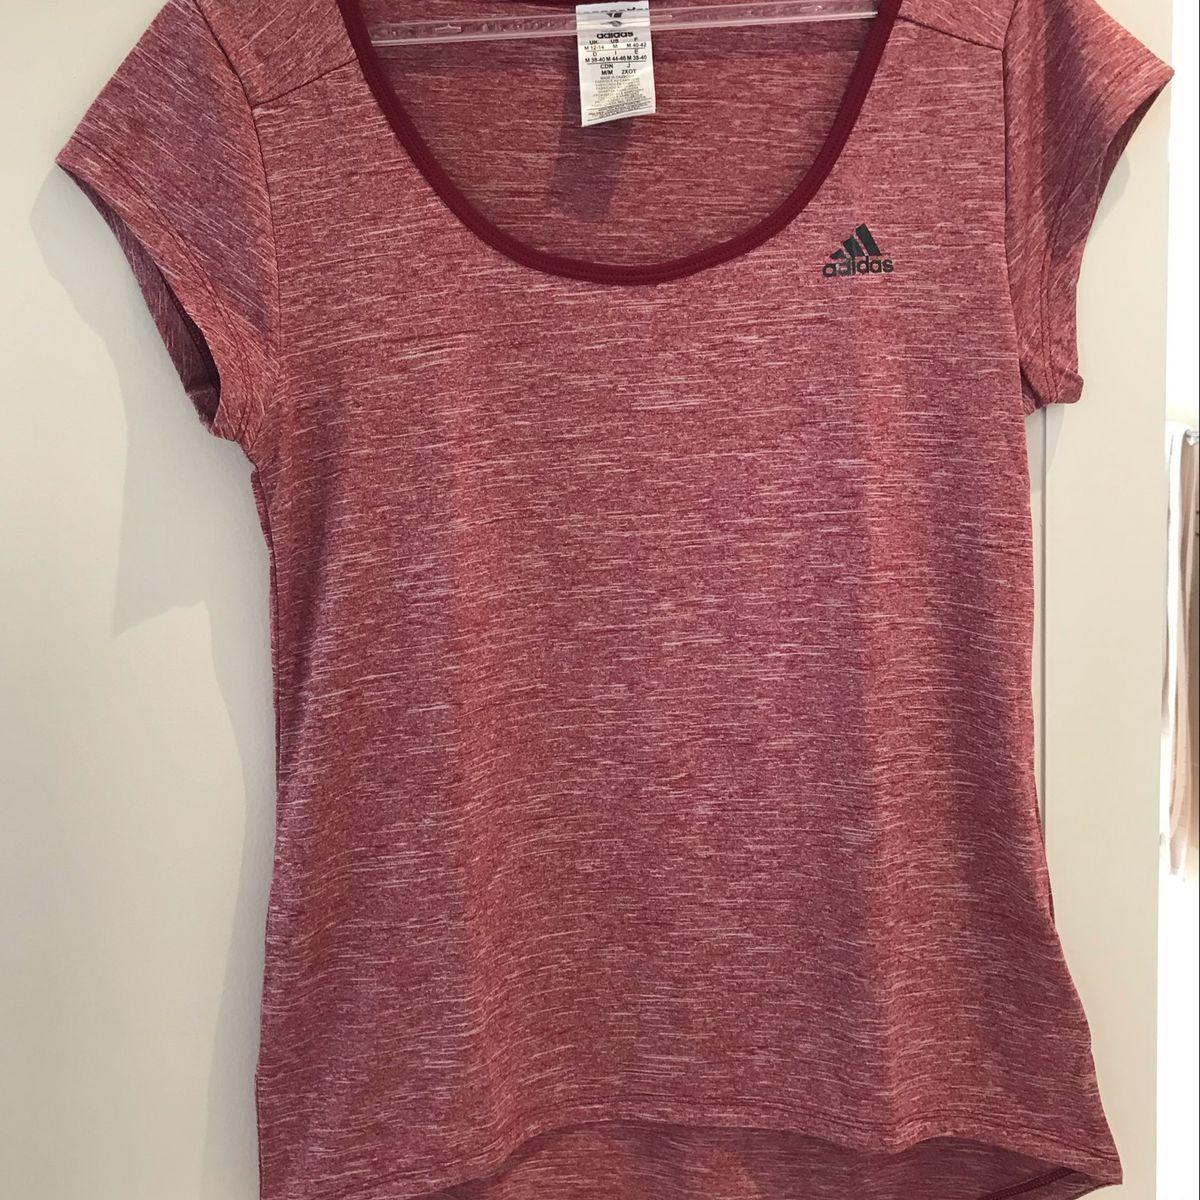 blusa adidas vermelha blusas adidas   Blusa adidas, Adidas